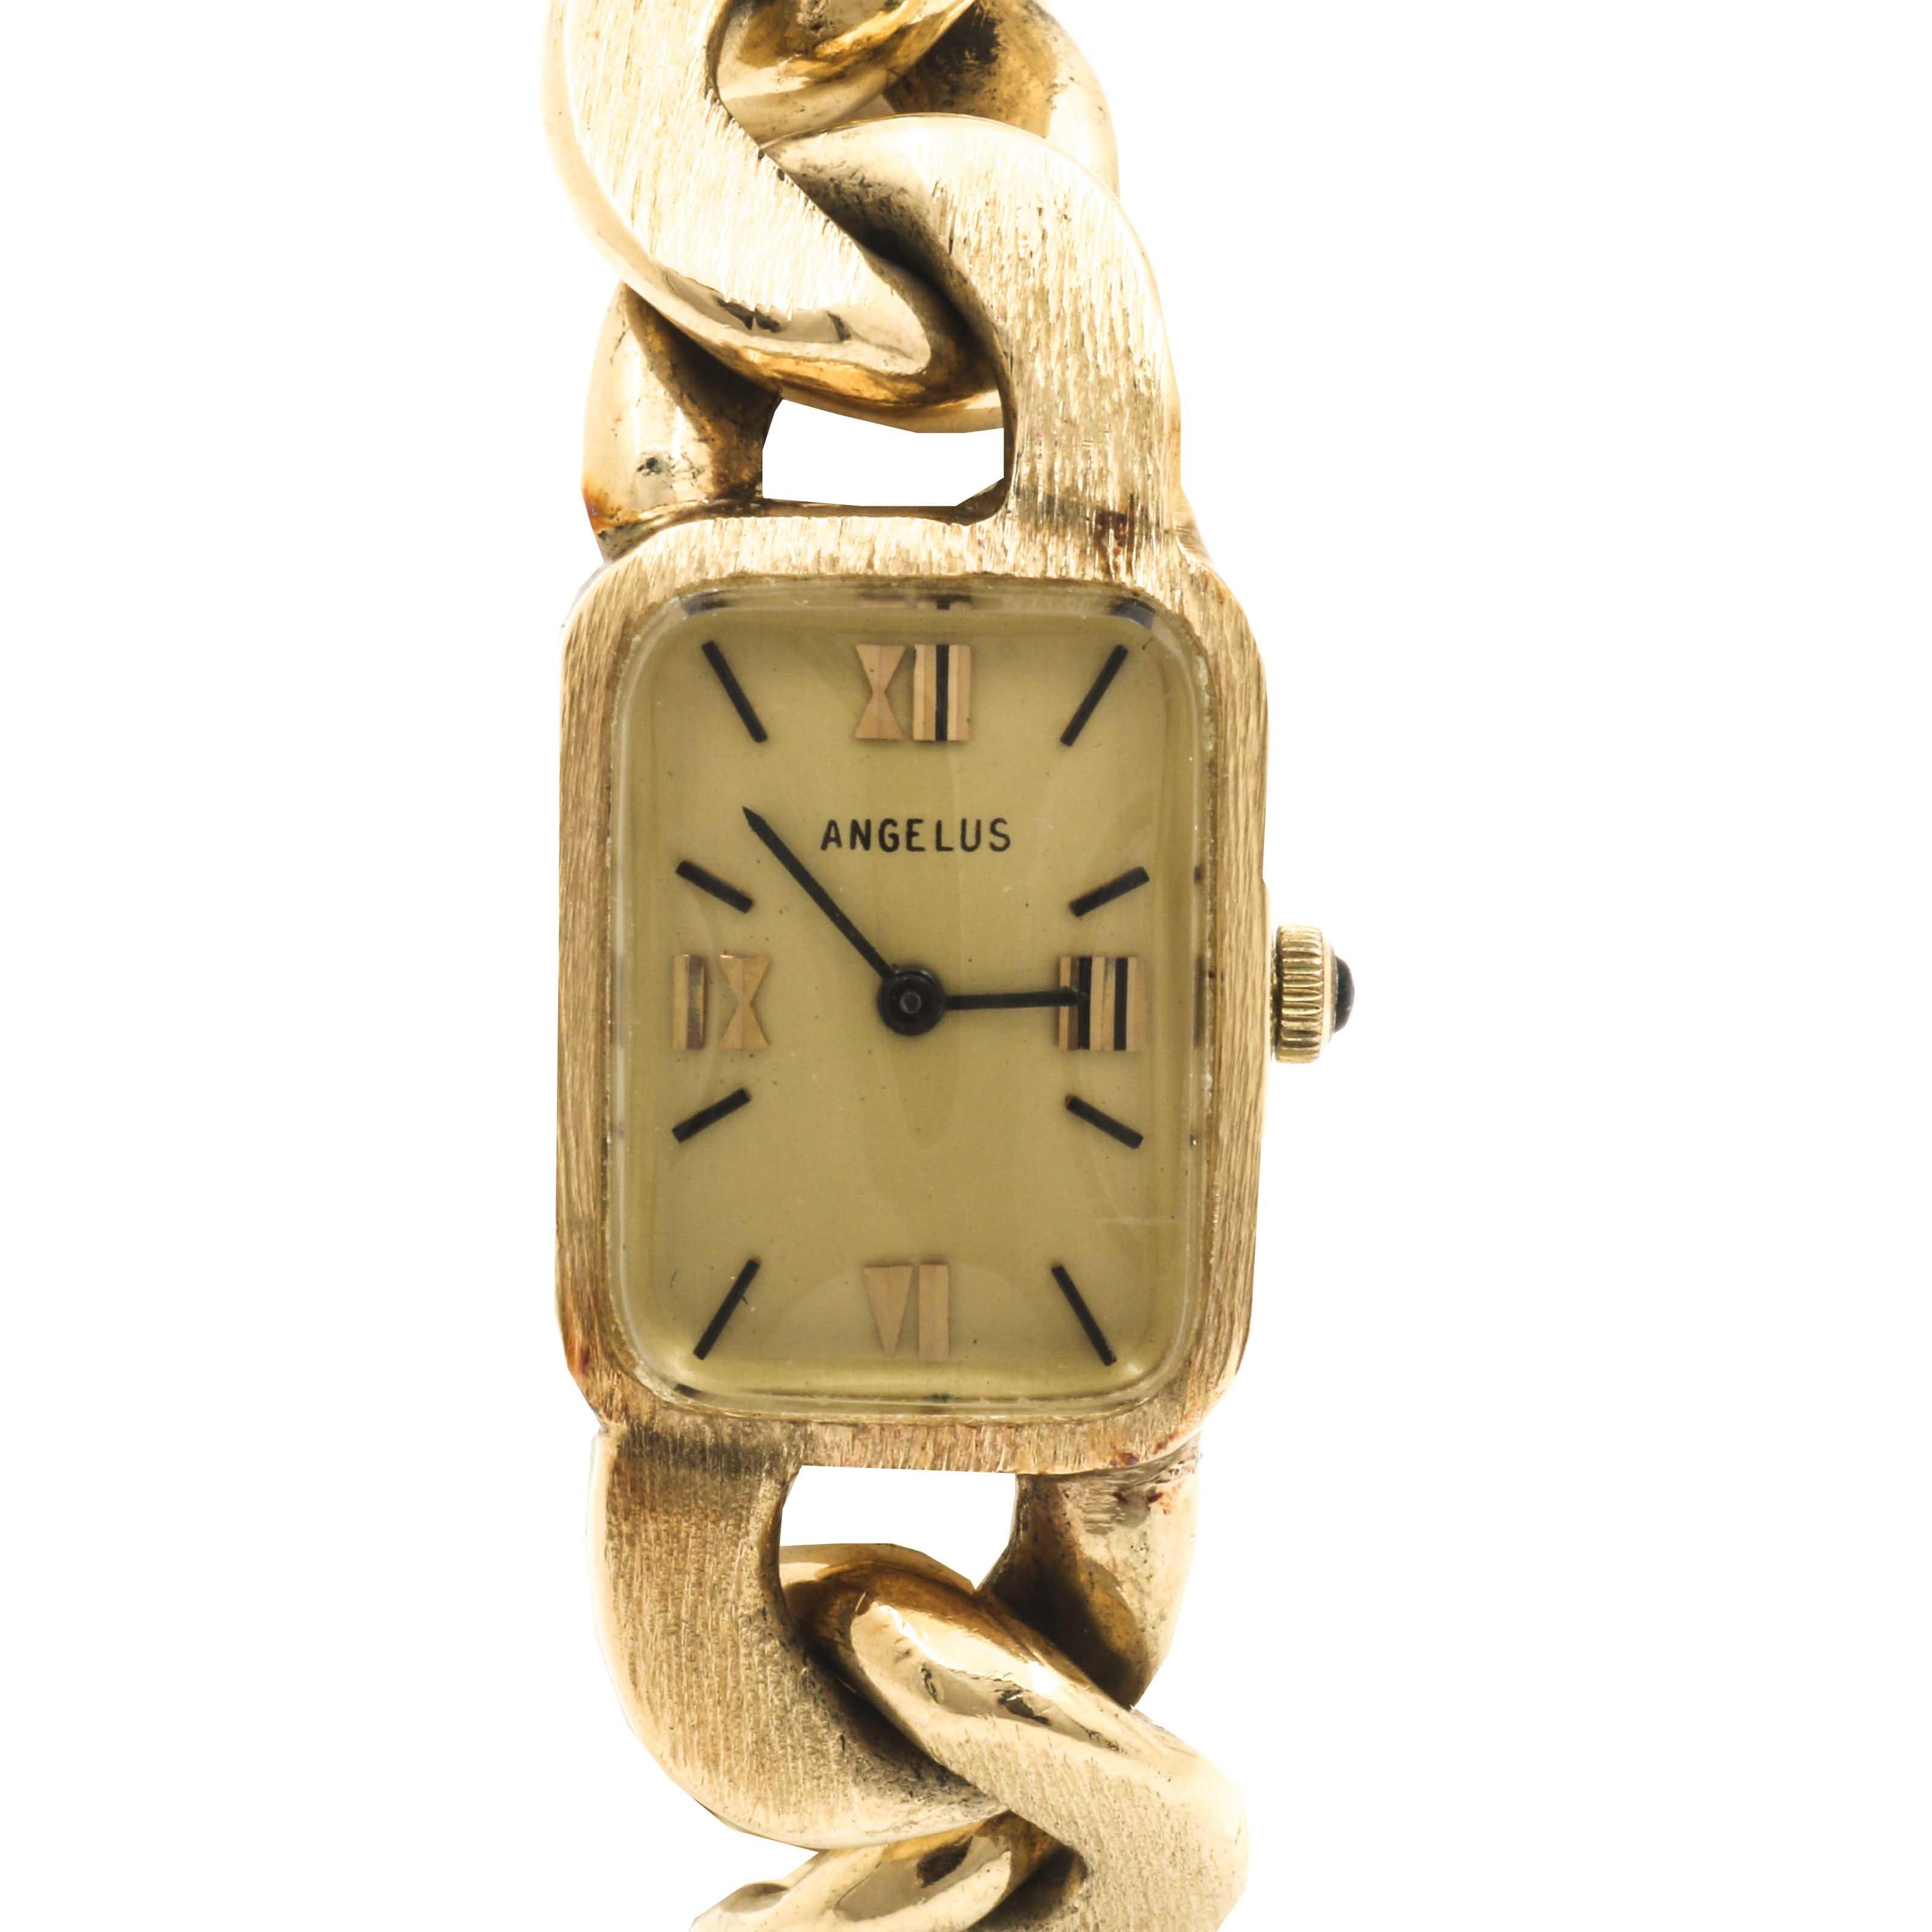 Angelus 14K Yellow Gold Wristwatch